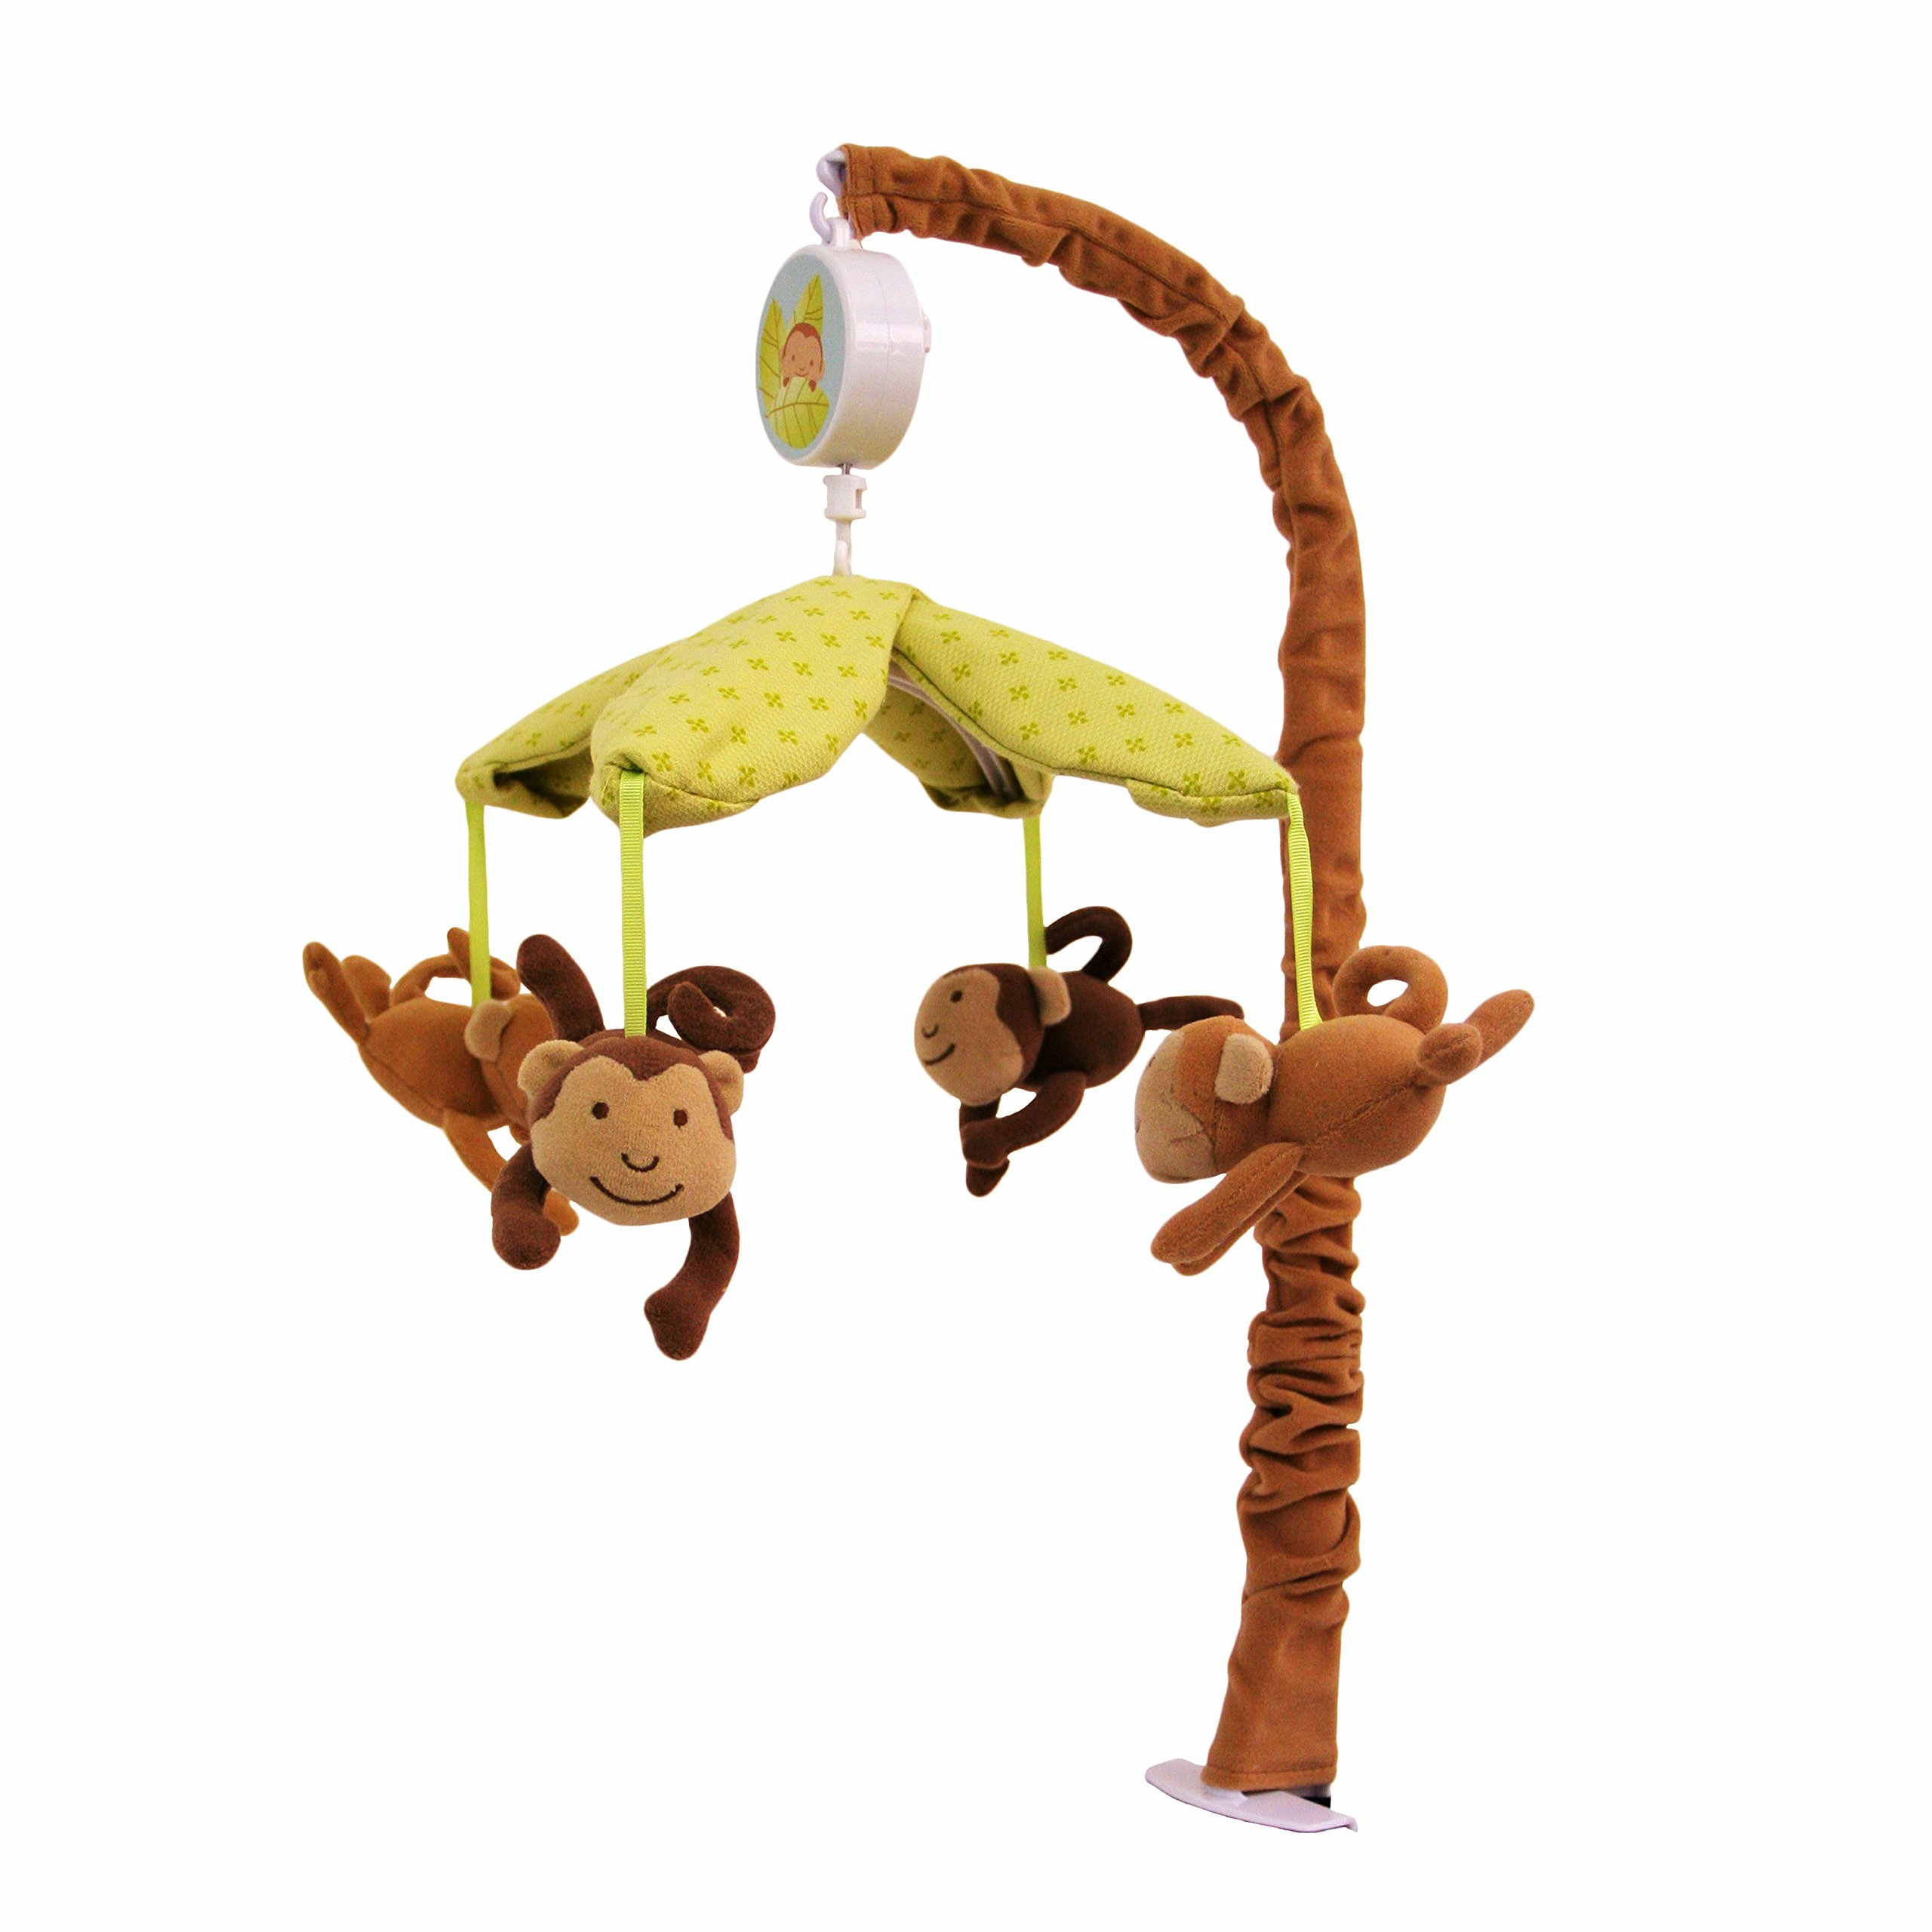 Nurture Imagination Swing Monkeys Nursery Musical Crib Mobile, Jungle Safari Animals